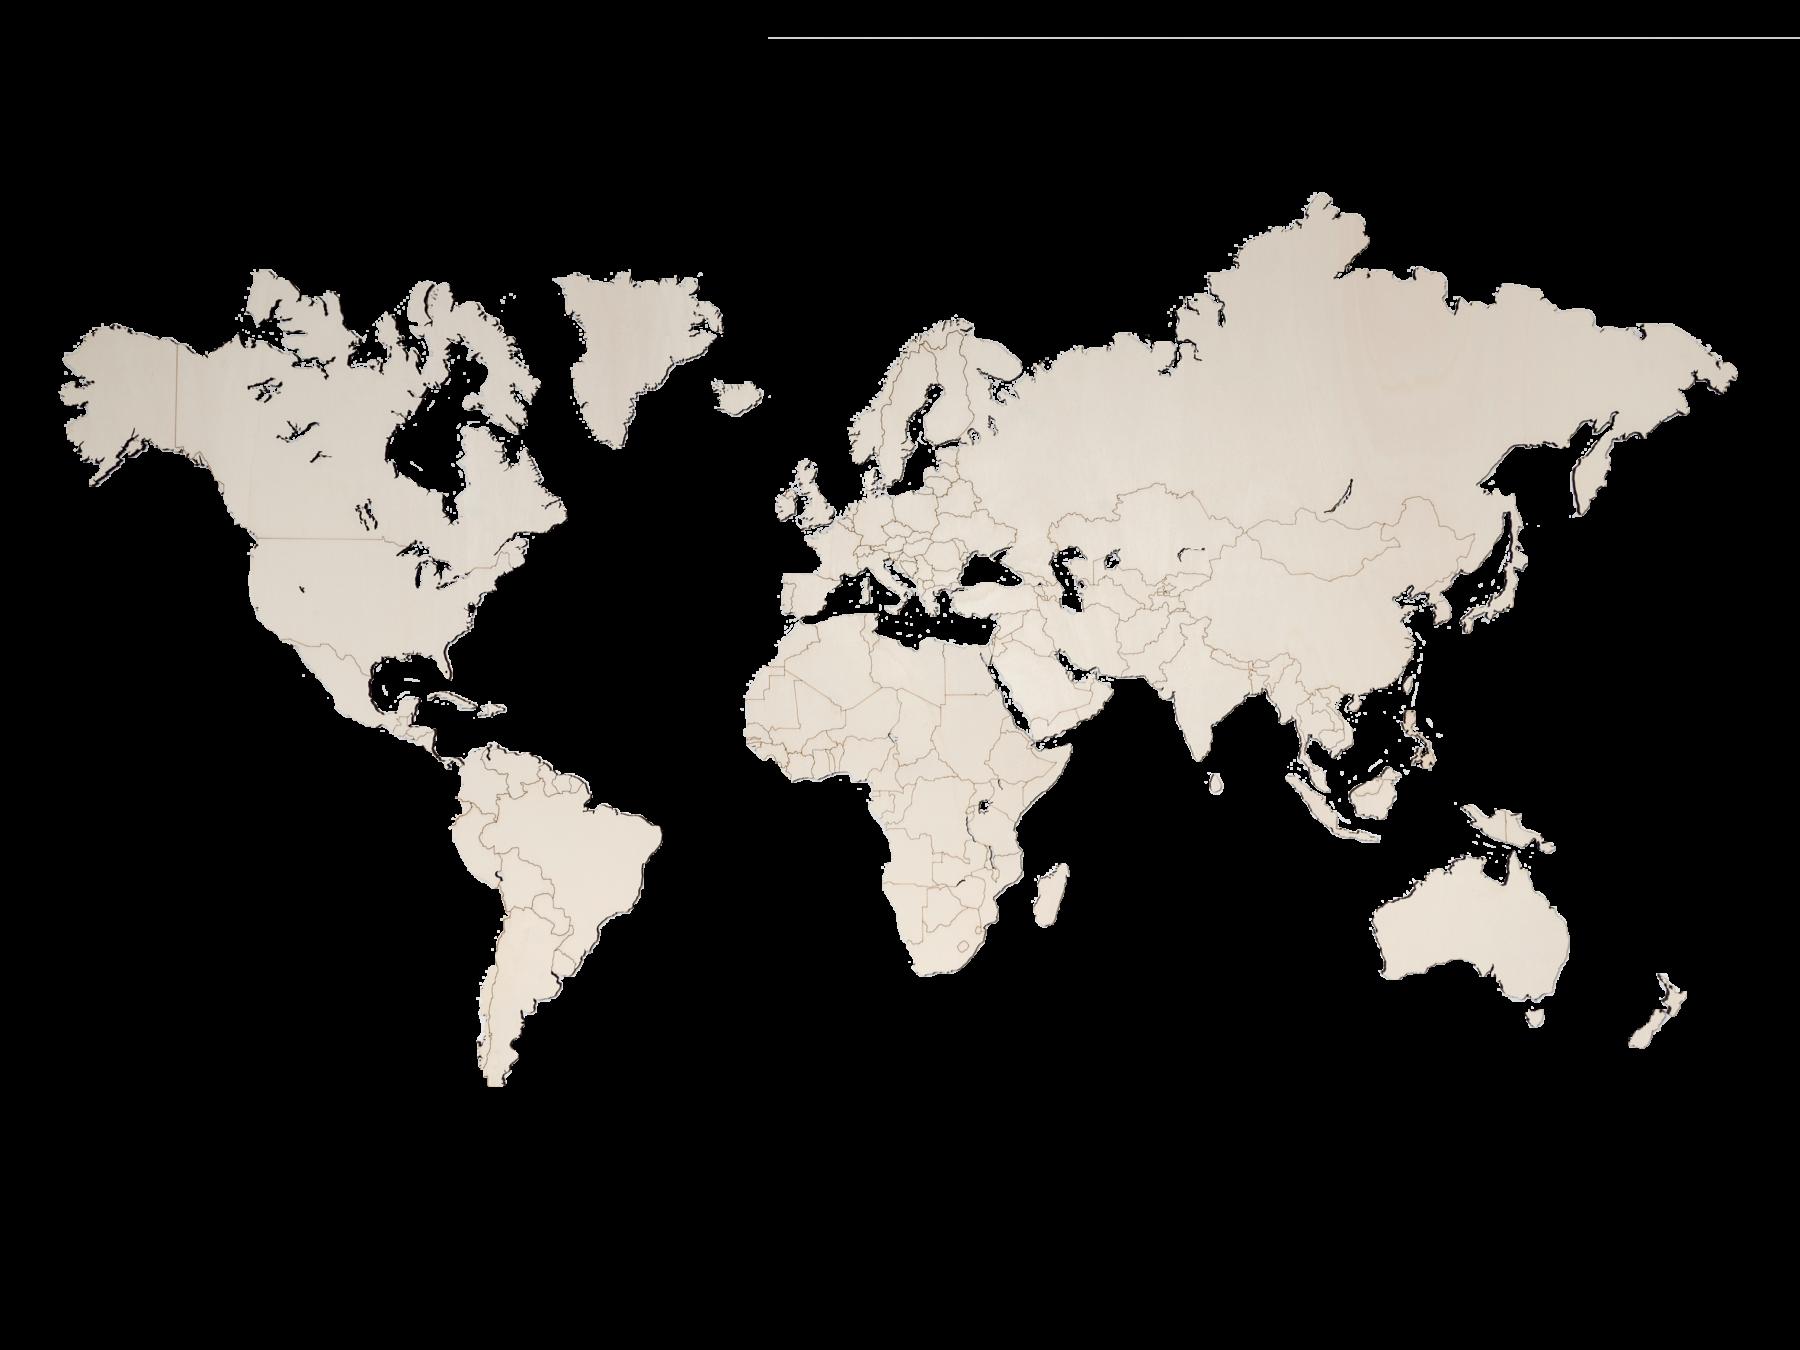 Weltkarte aus Pappelholz